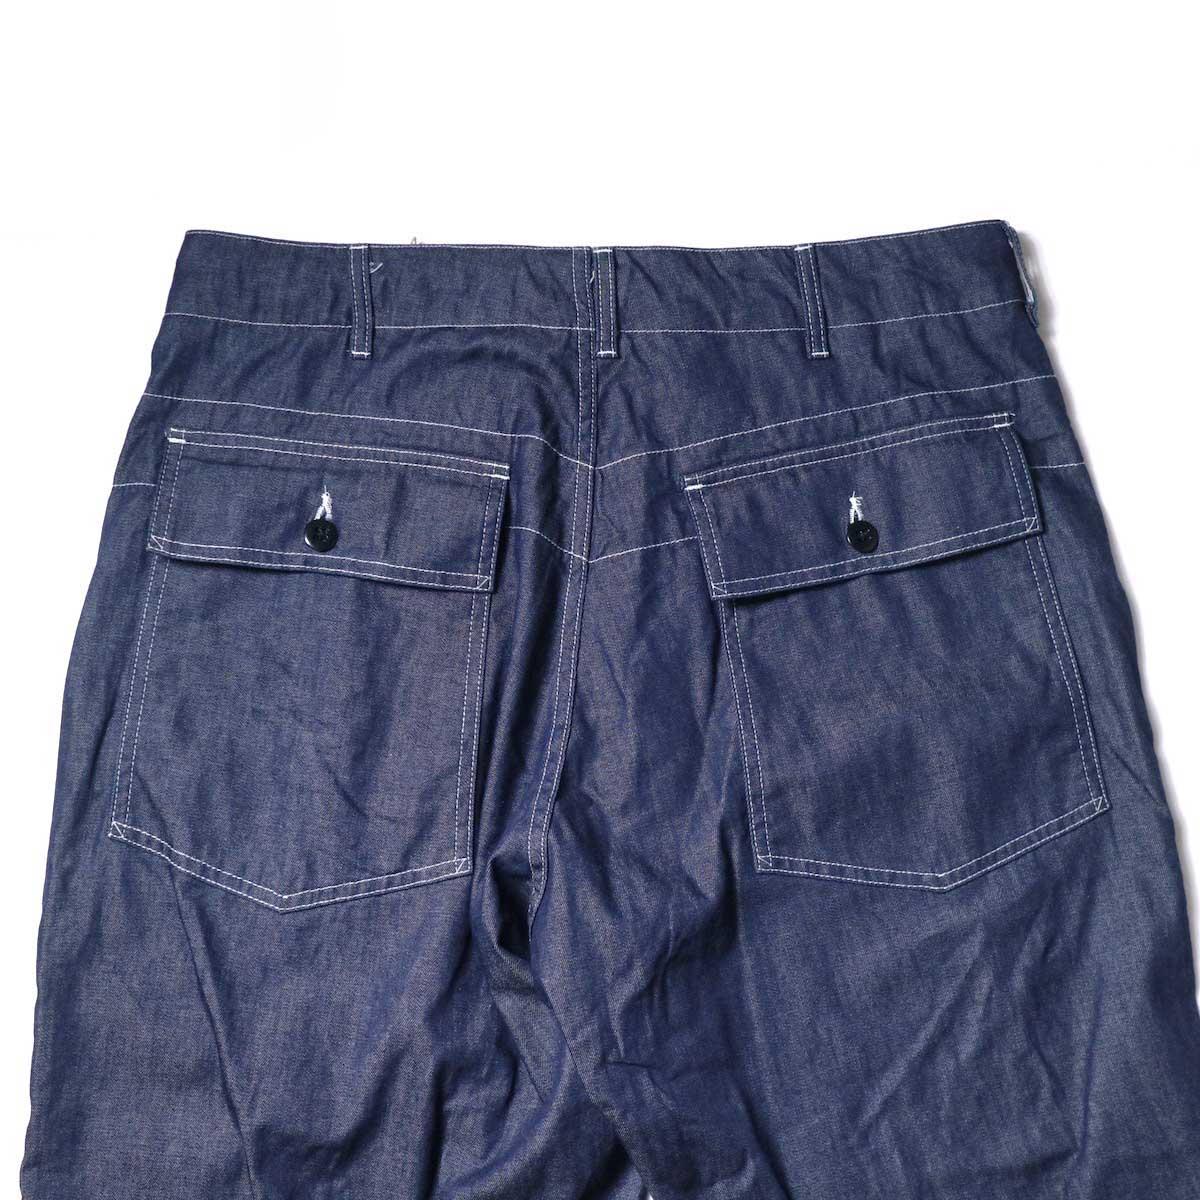 Engineered Garments / Fatigue Pant - 8oz Cone Denim (Indigo)ヒップポケット